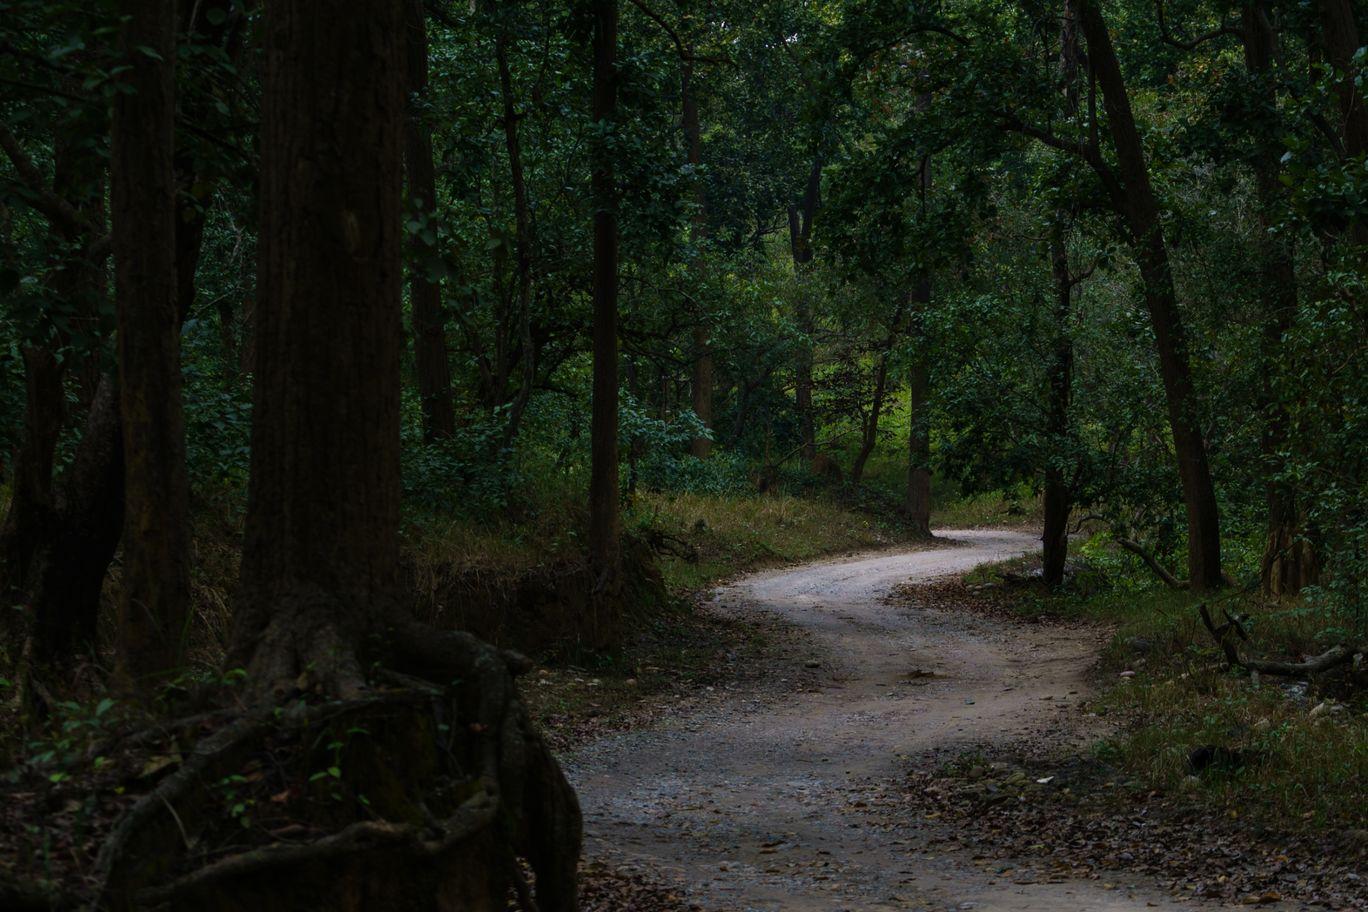 Photo of Jim Corbett National Park By Sandeep Sreedhar